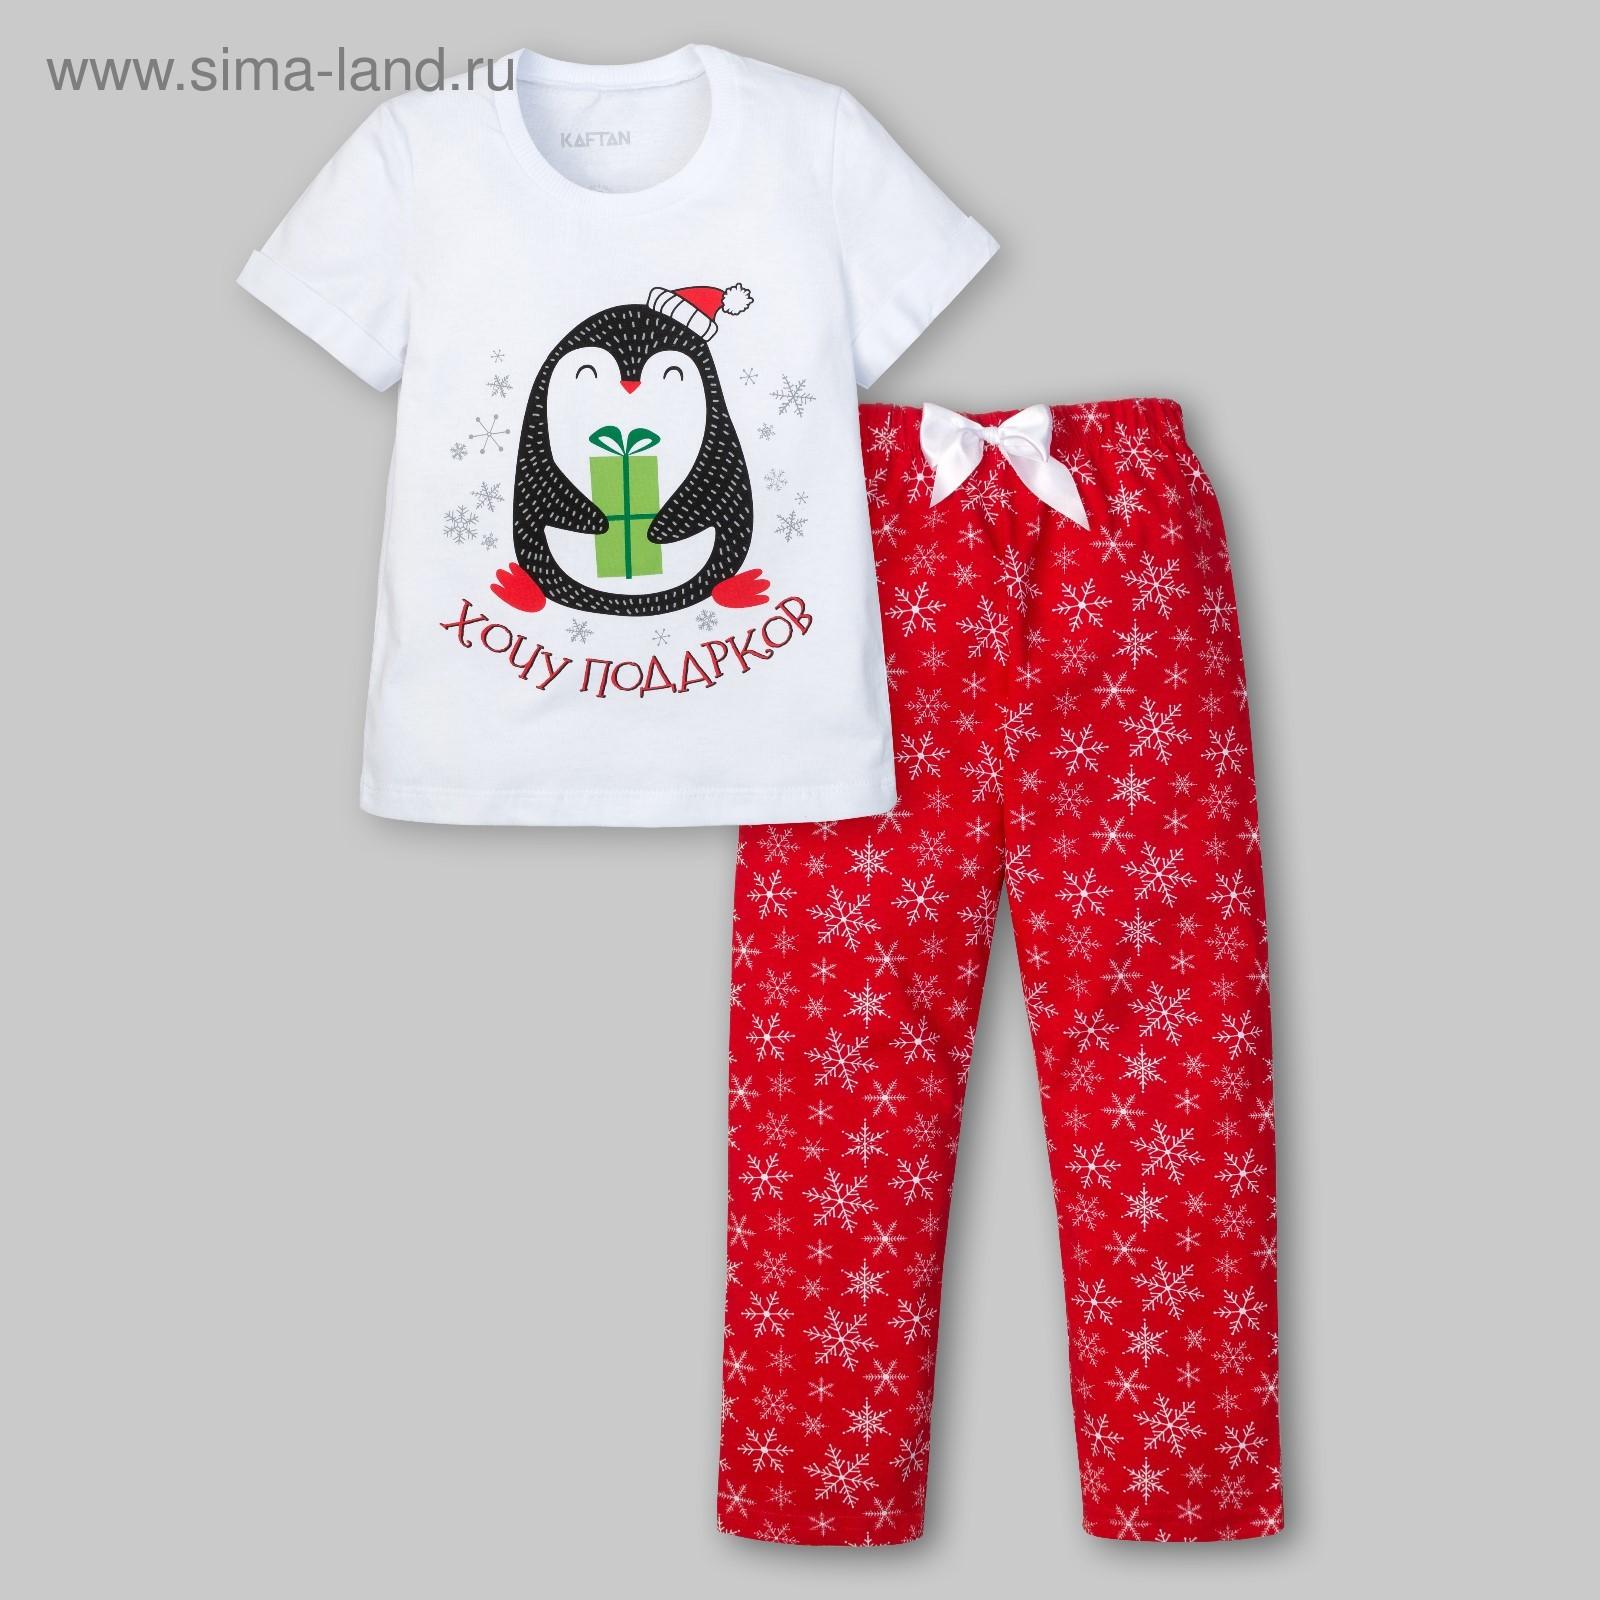 acc47e37002e5 Пижама для девочки: джемпер и брюки KAFTAN «Хочу подарков», 5–6 лет ...